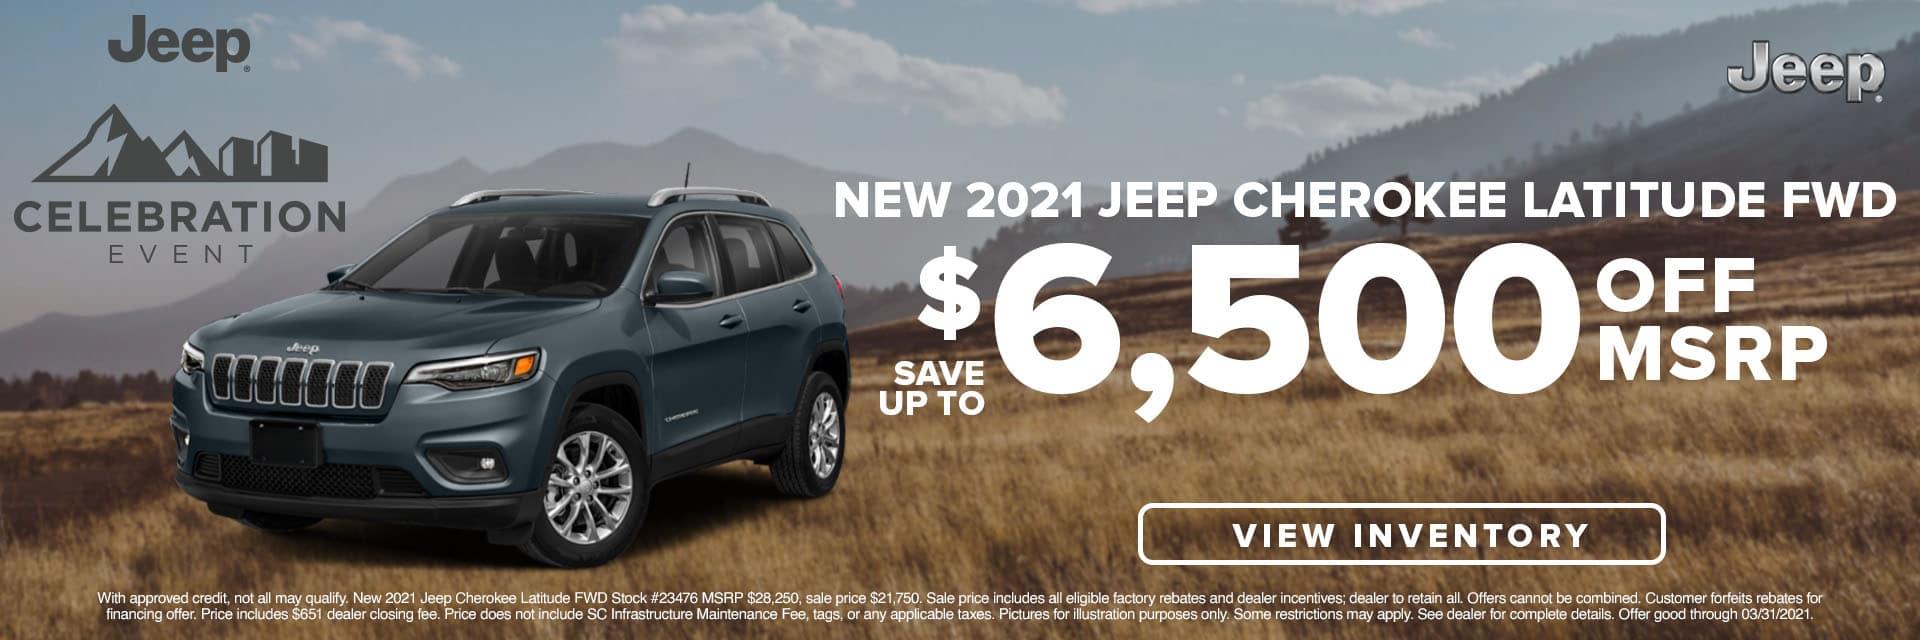 SLCJ-March 2021-2021 Jeep Cherokee